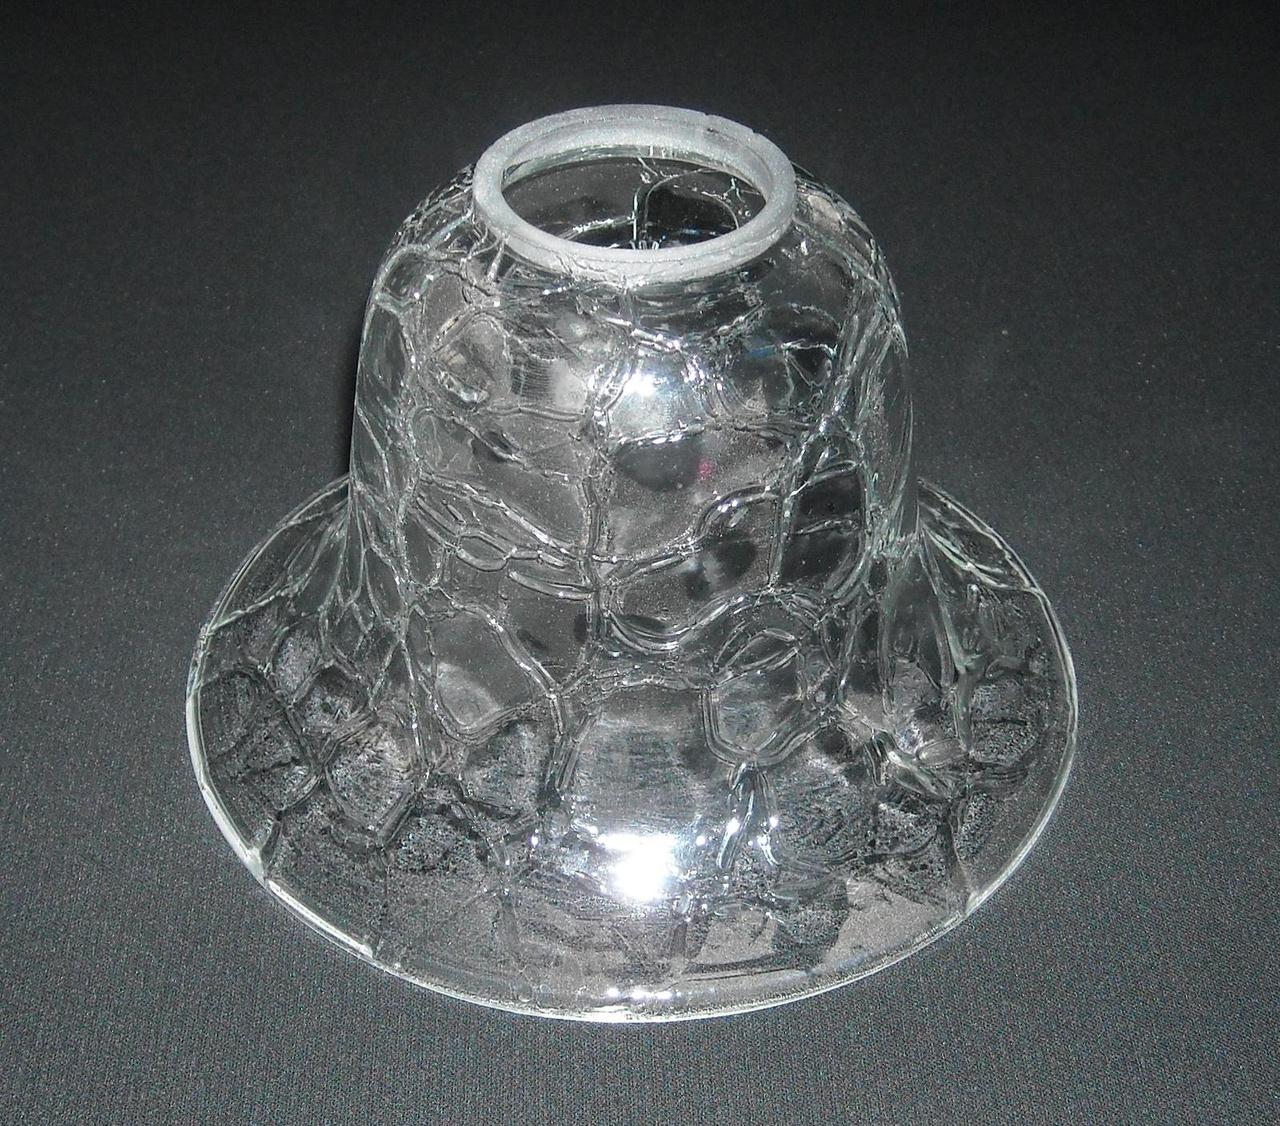 lampenschirm aus glas glasschirm k0512x6 ca 16 5 cm. Black Bedroom Furniture Sets. Home Design Ideas